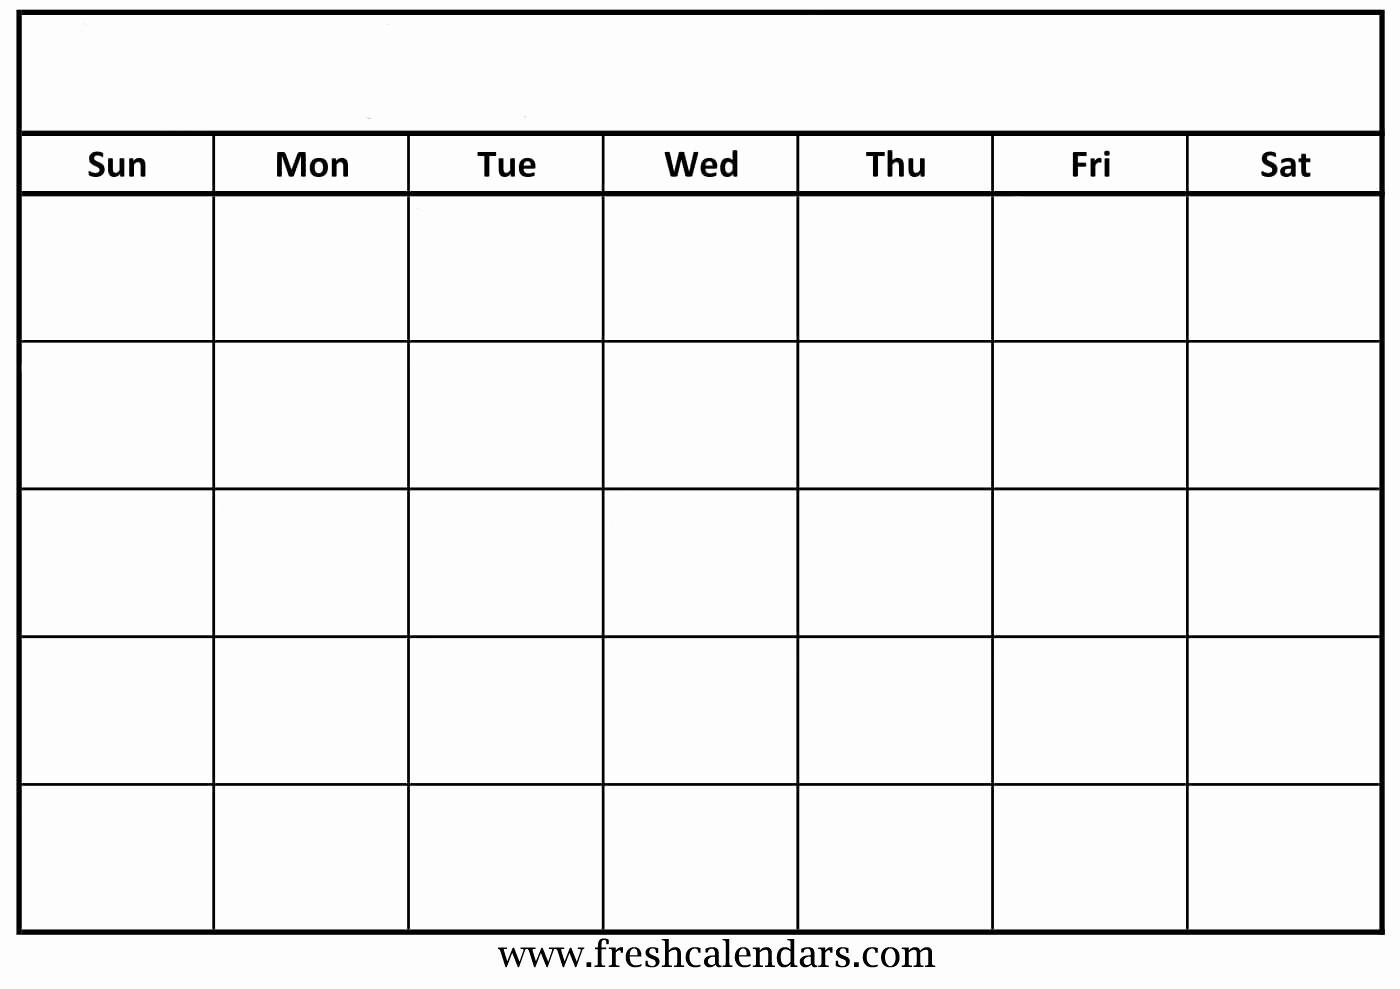 Free Printable Weekly Calendar 2019 Inspirational Blank Calendar Wonderfully Printable 2019 Templates